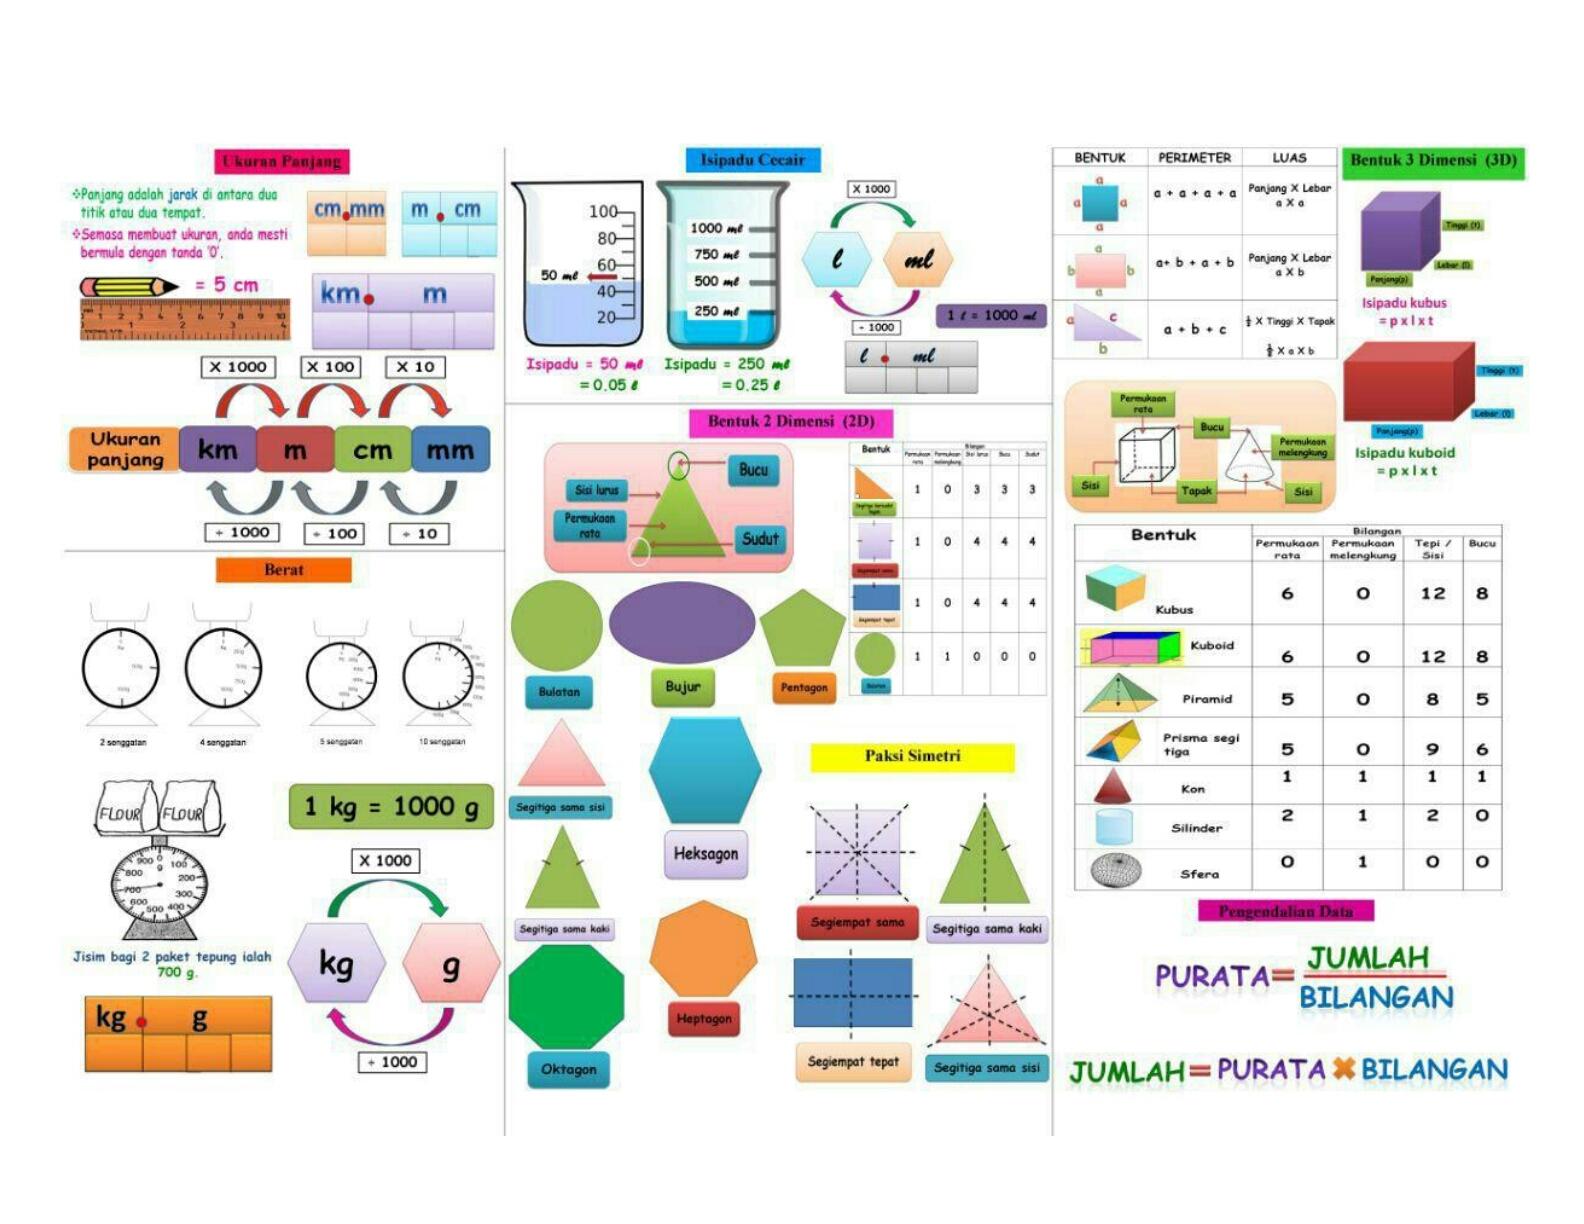 Nota Padat Matematik Upsr Yang Bermanfaat Nota formula Matematik Pendidik2u Of Senarai Nota Padat Matematik Upsr Yang Penting Untuk Guru-guru Perolehi